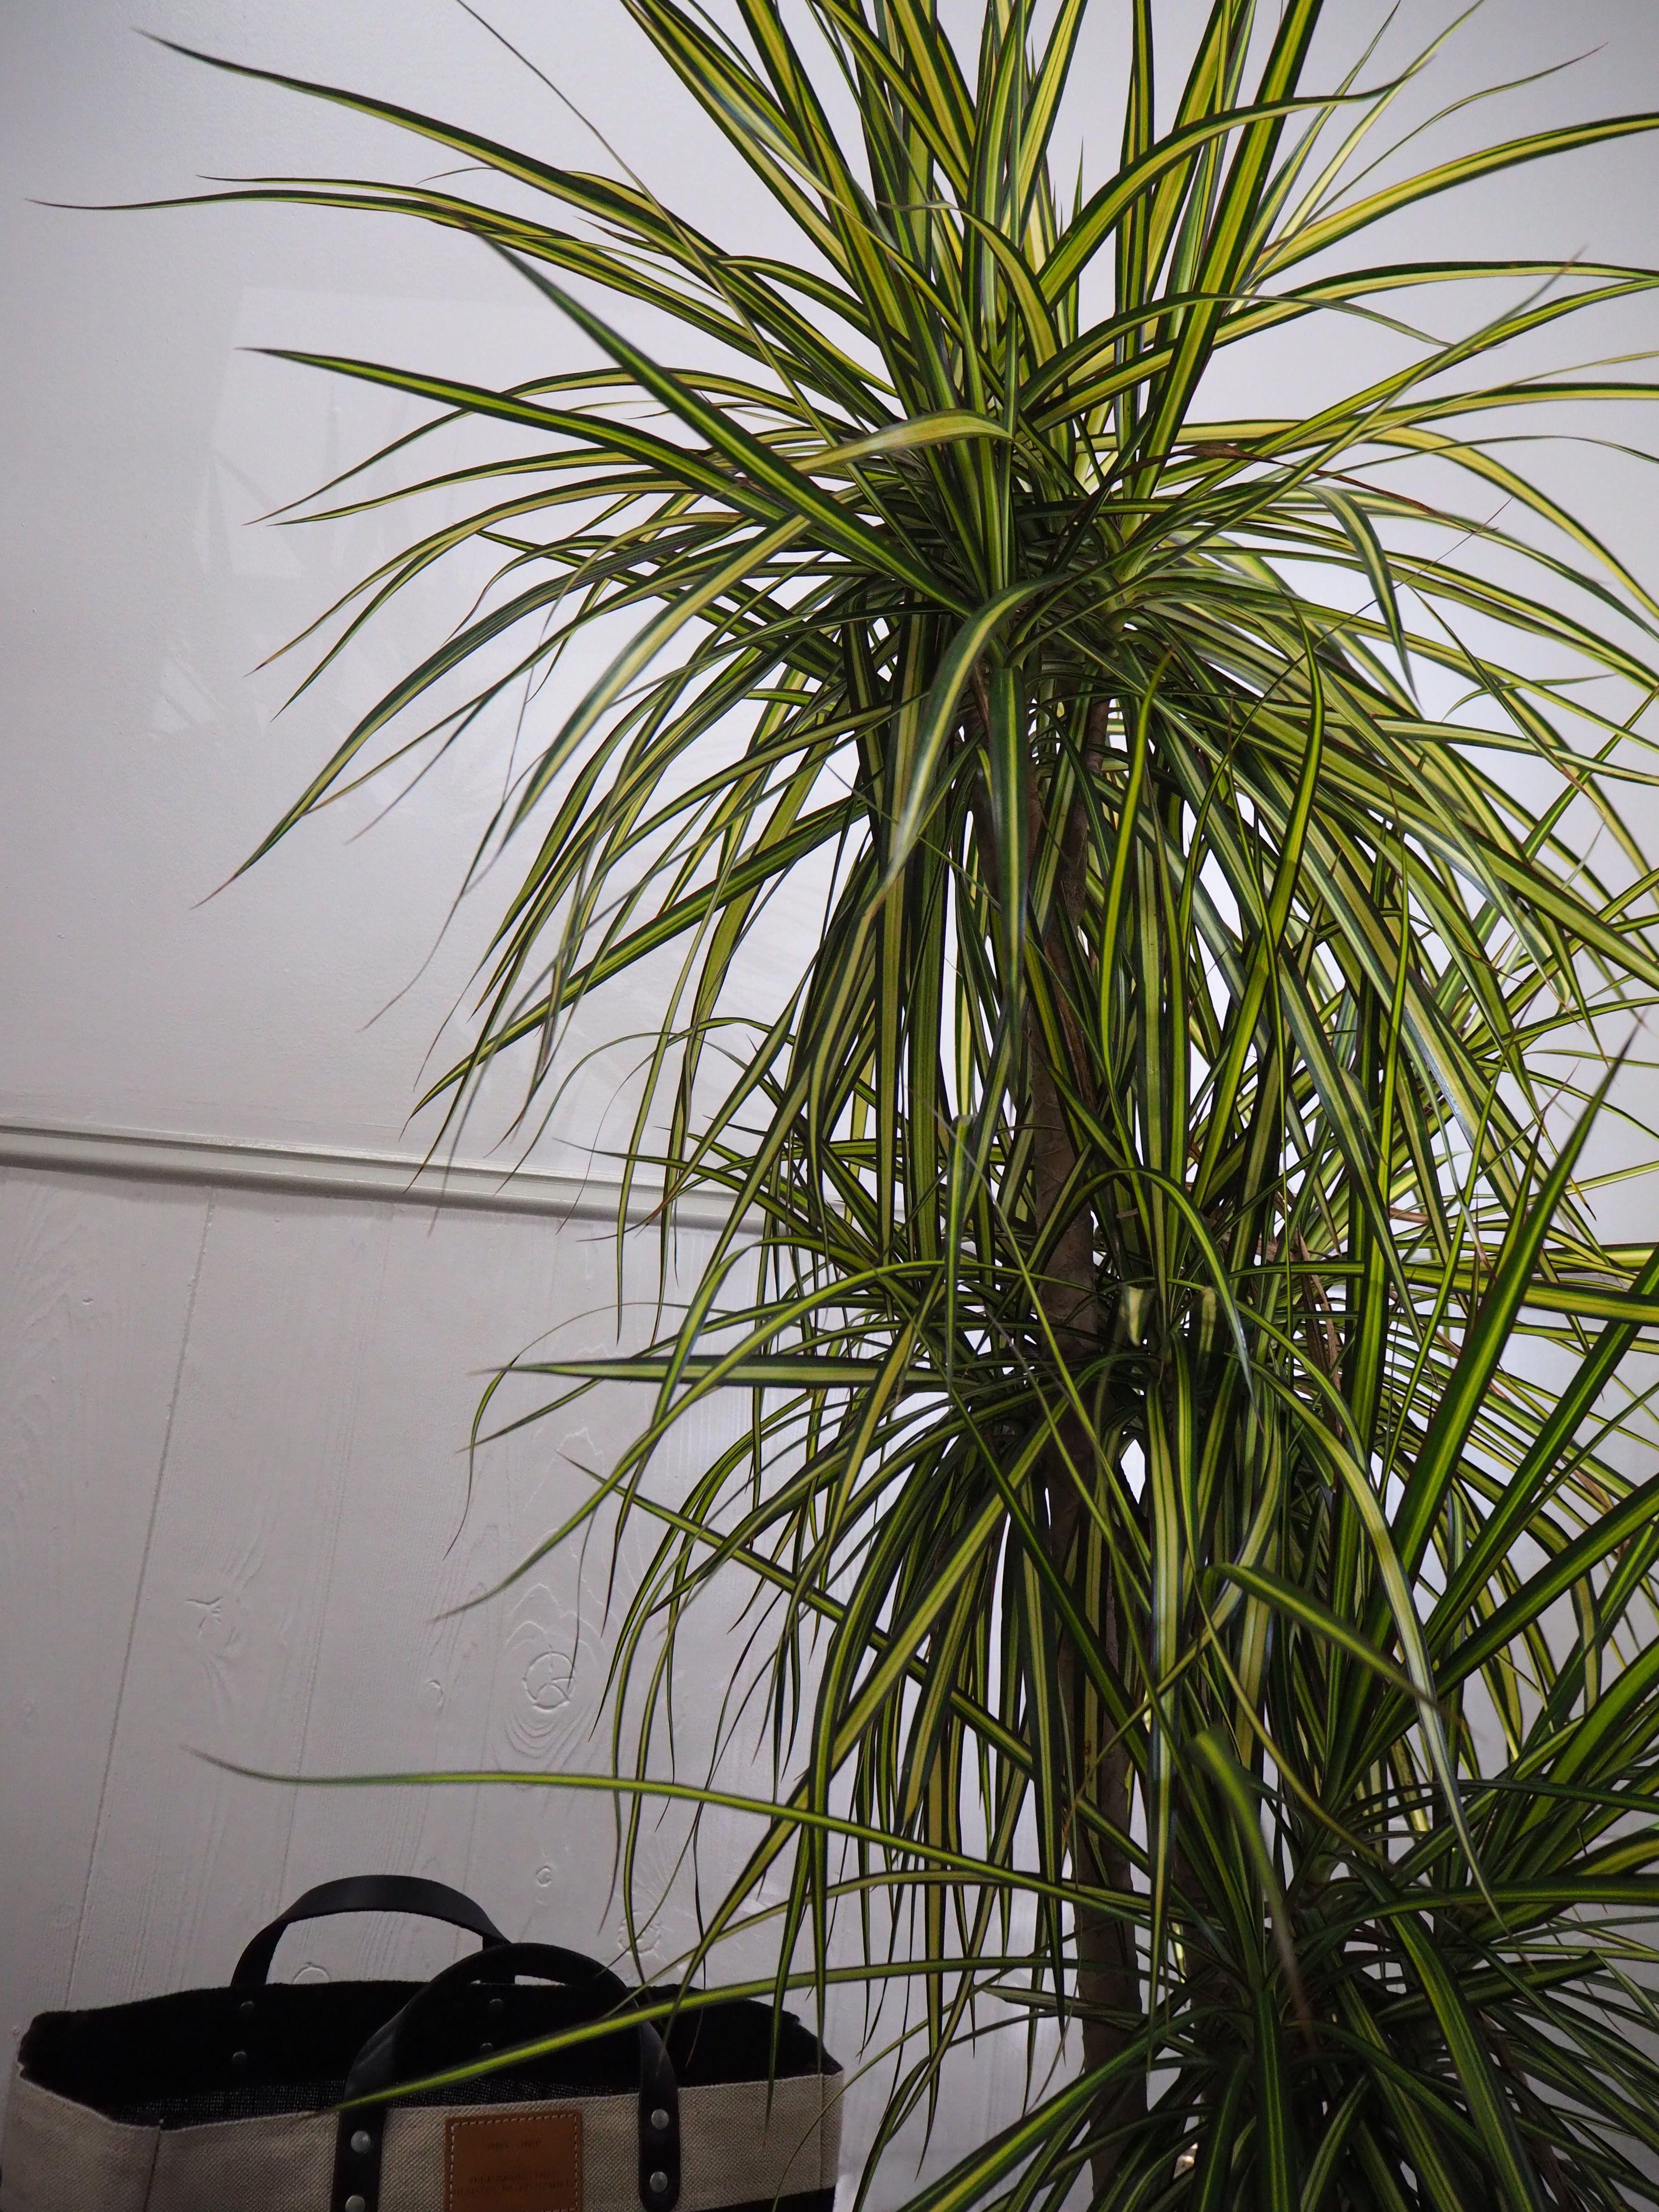 Dracaena Marginata Plant a Tropical Beauty Quality